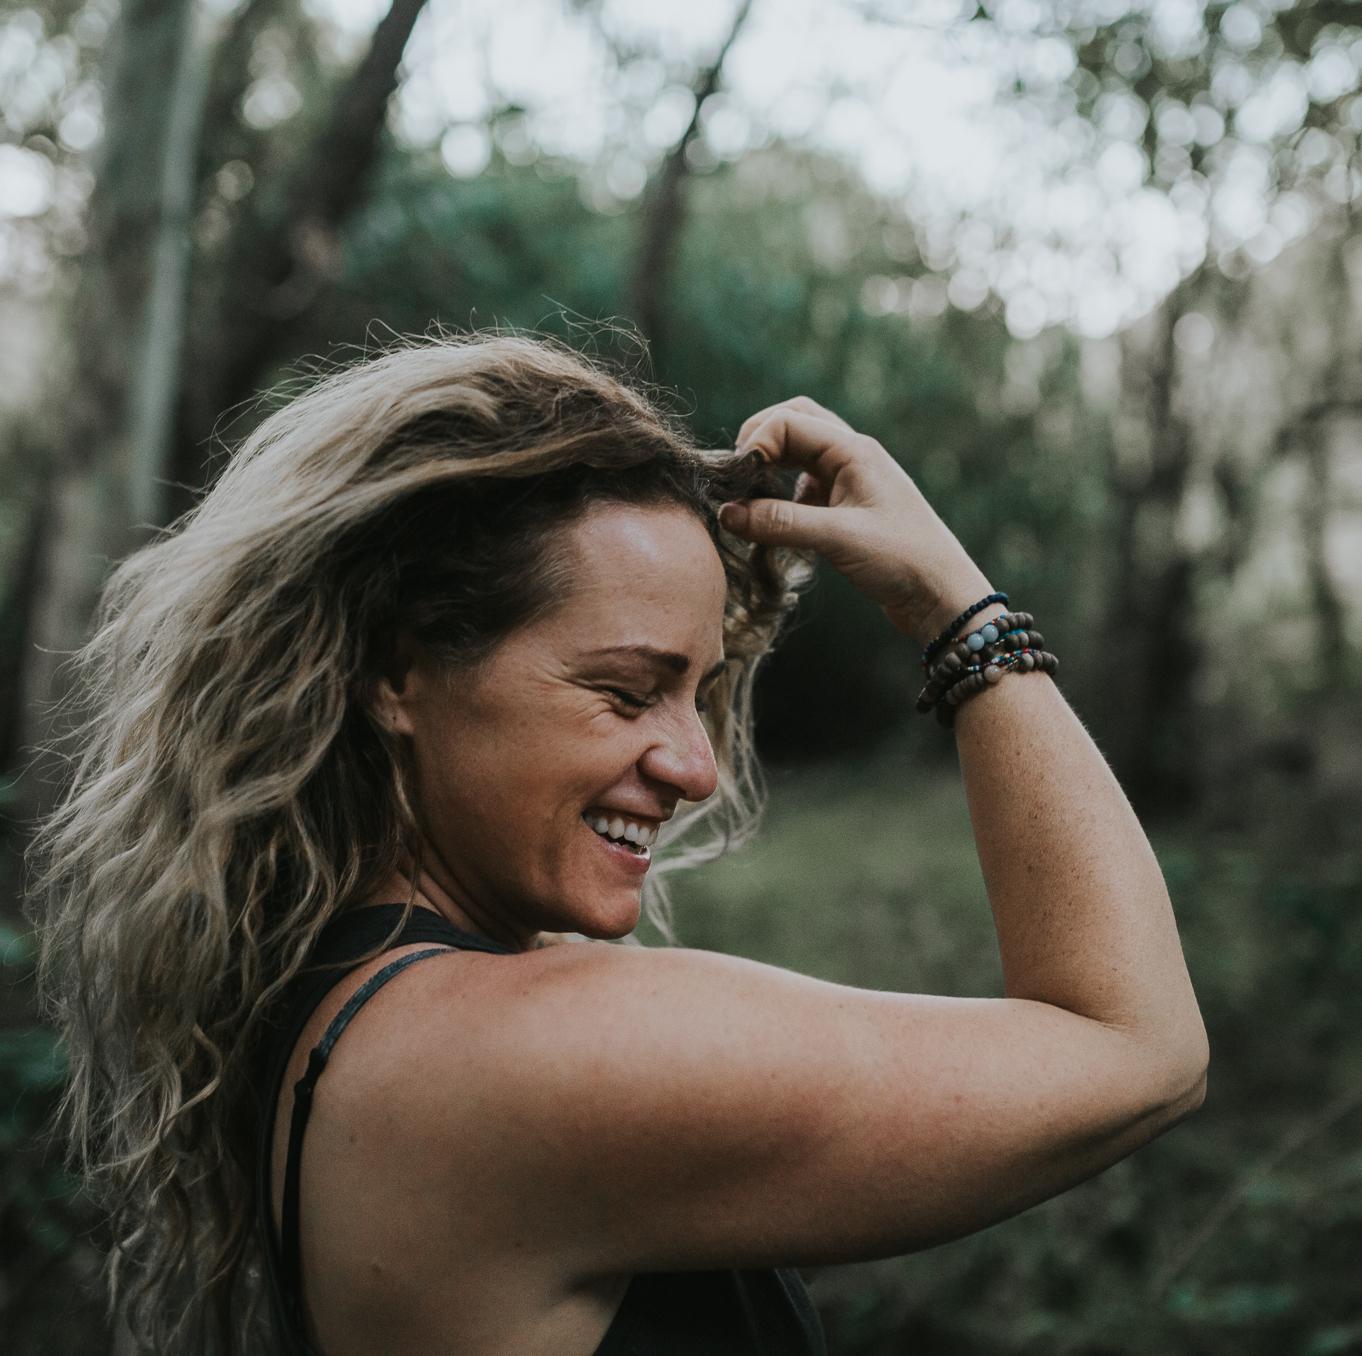 Rebecca Lane